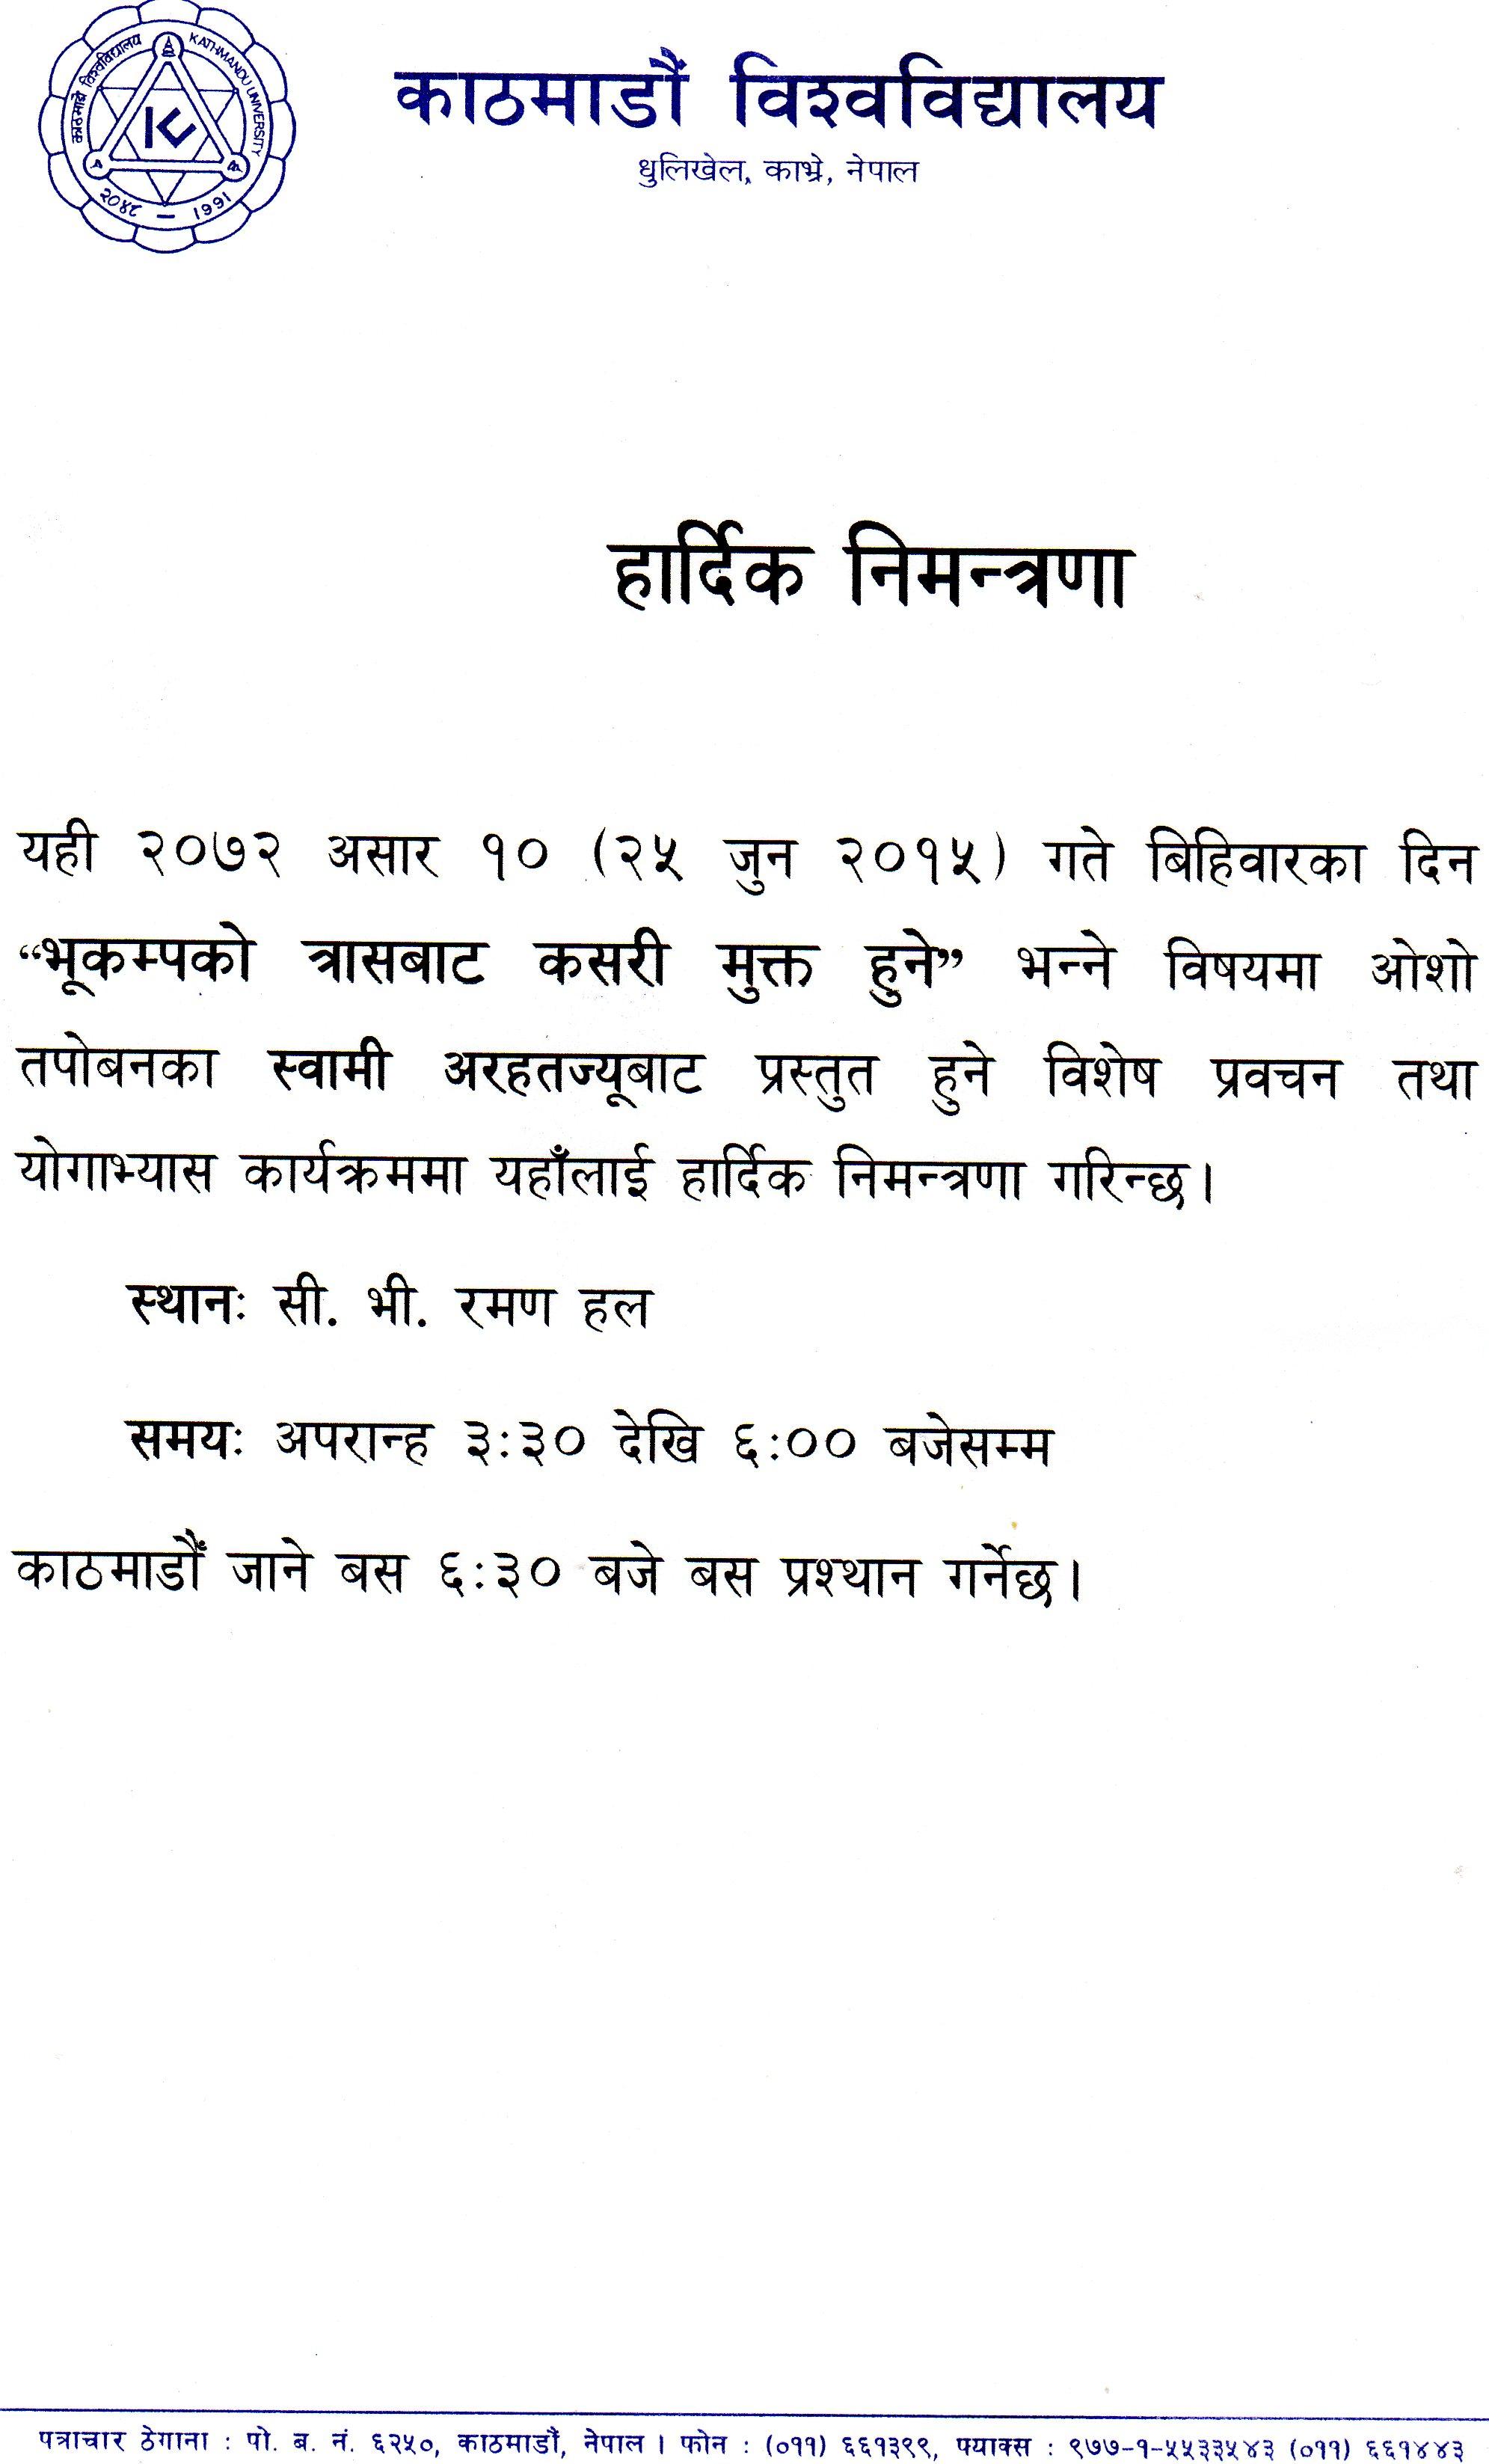 http://www.ku.edu.np/news/gallery/1/Swami%20lecture.jpg